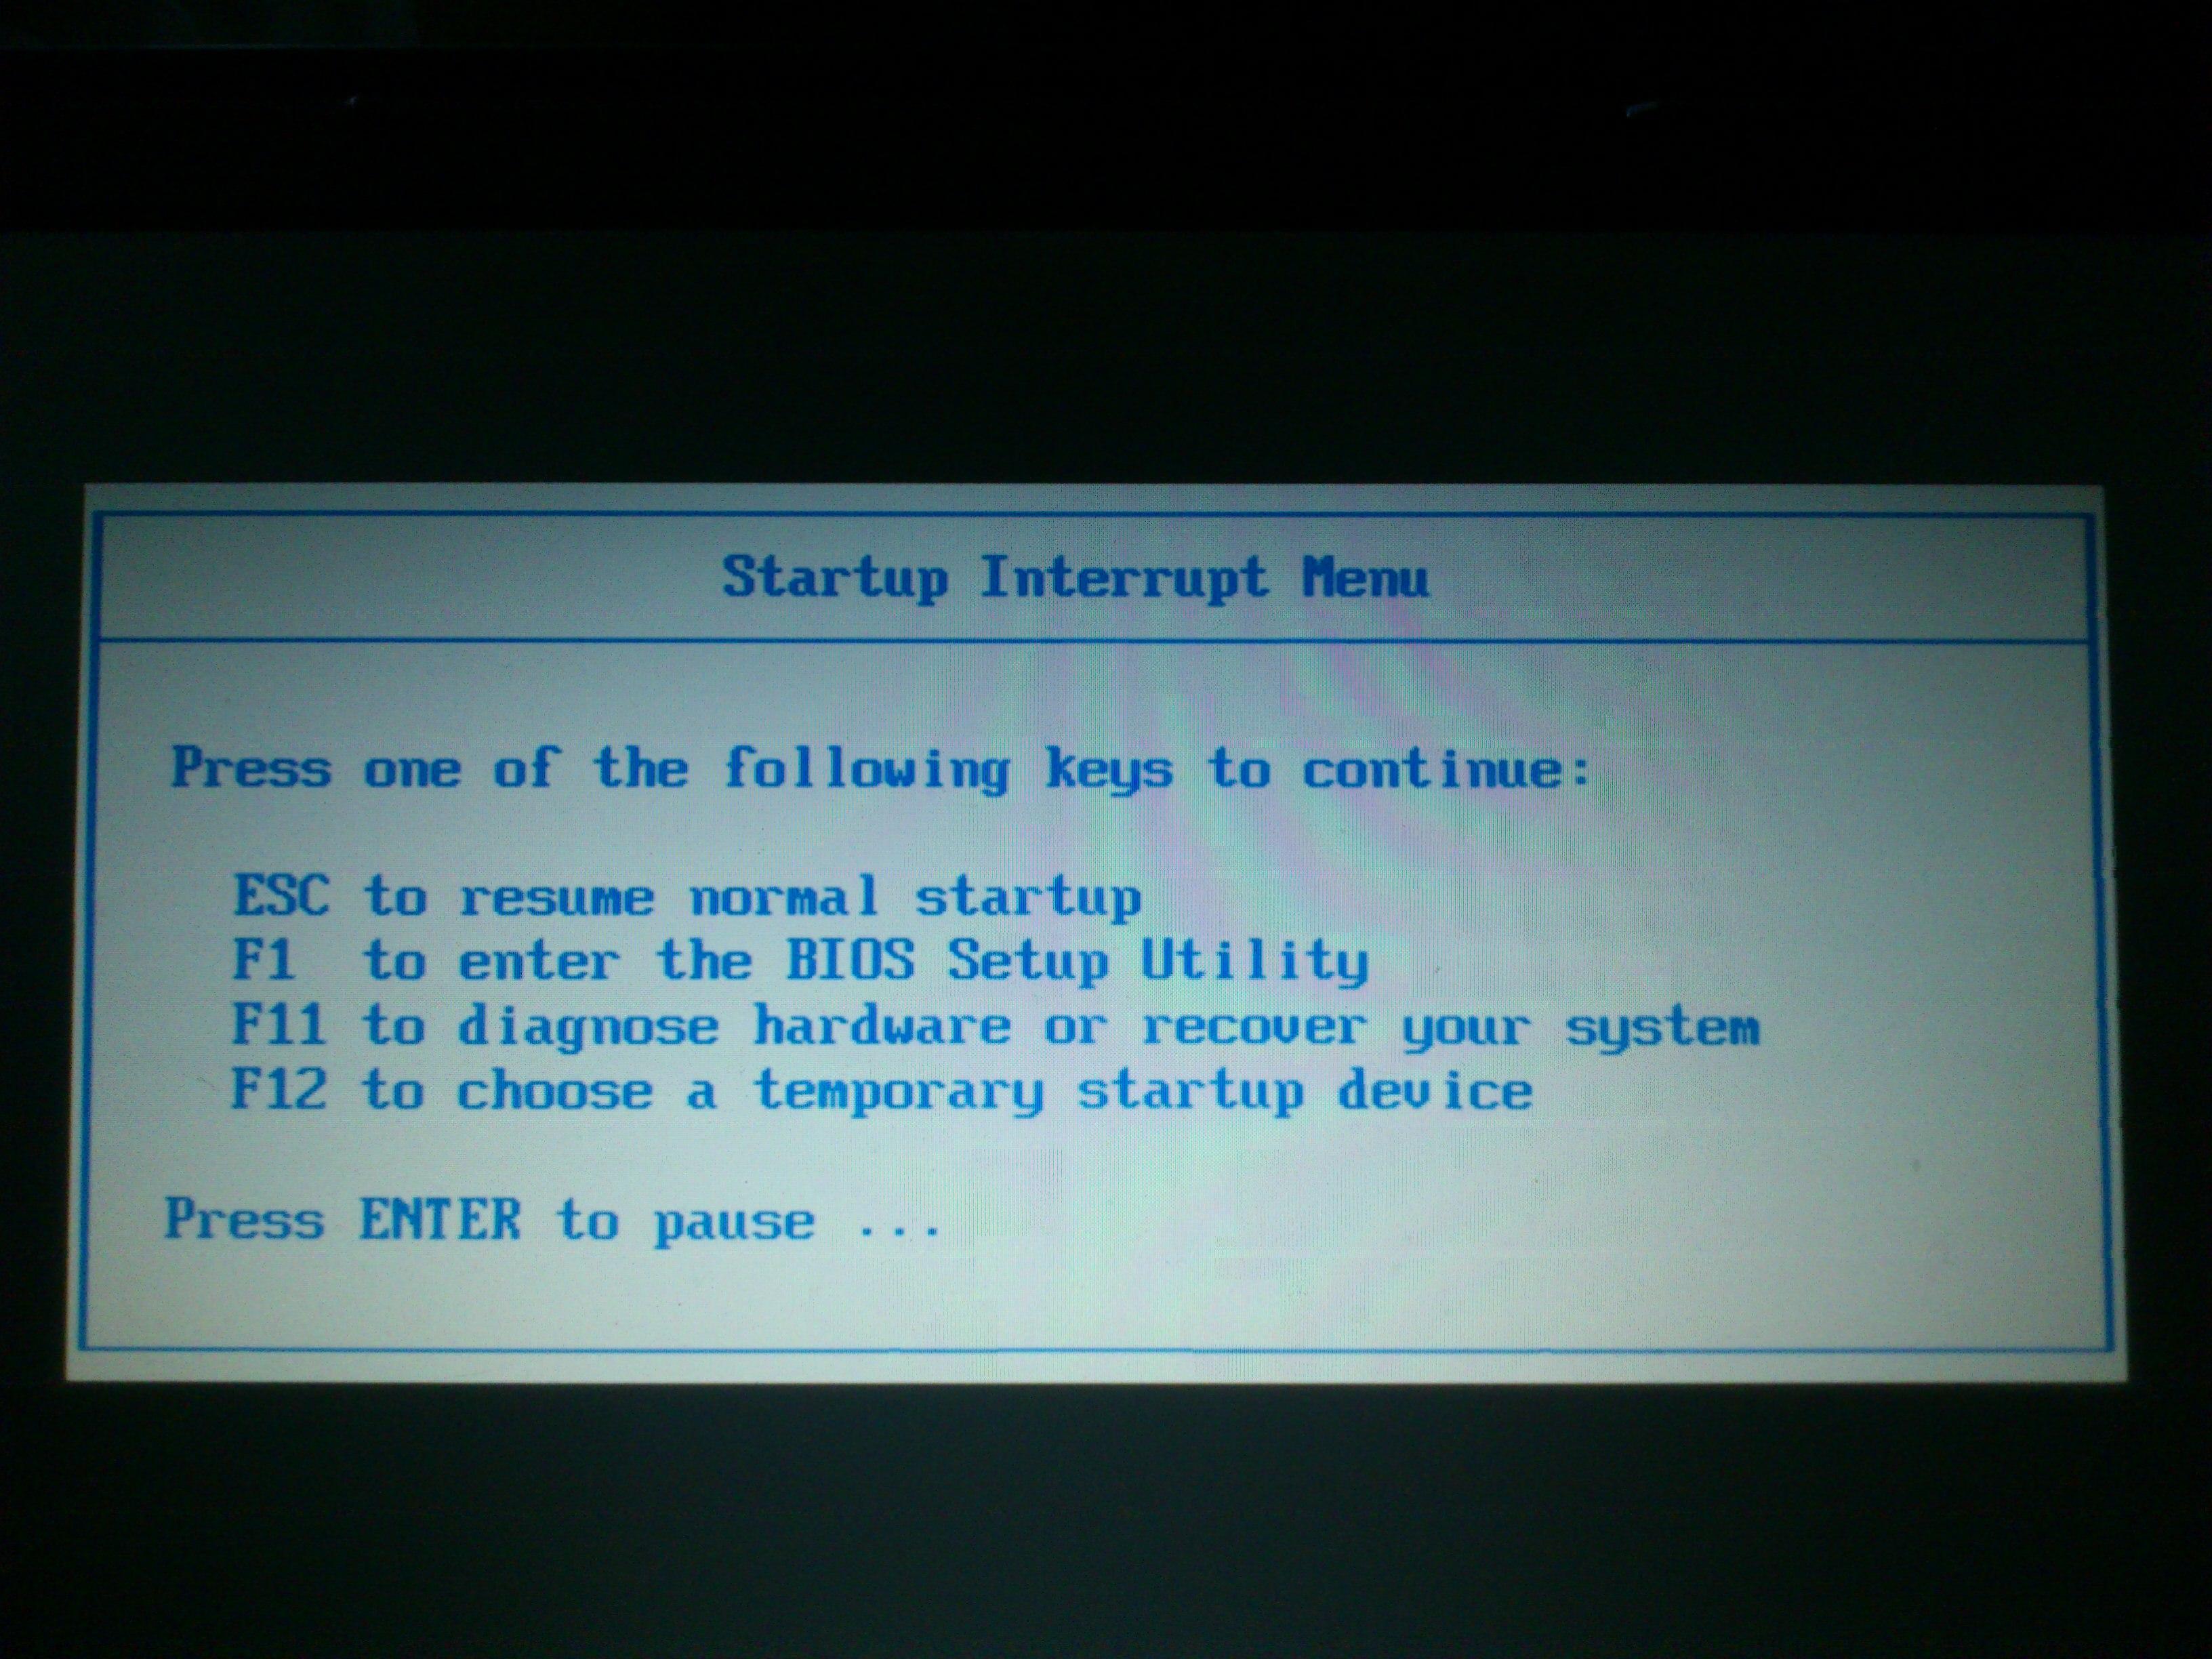 Lenovo 3000 N200 - Recorvery system nie chce si� uruchomi�